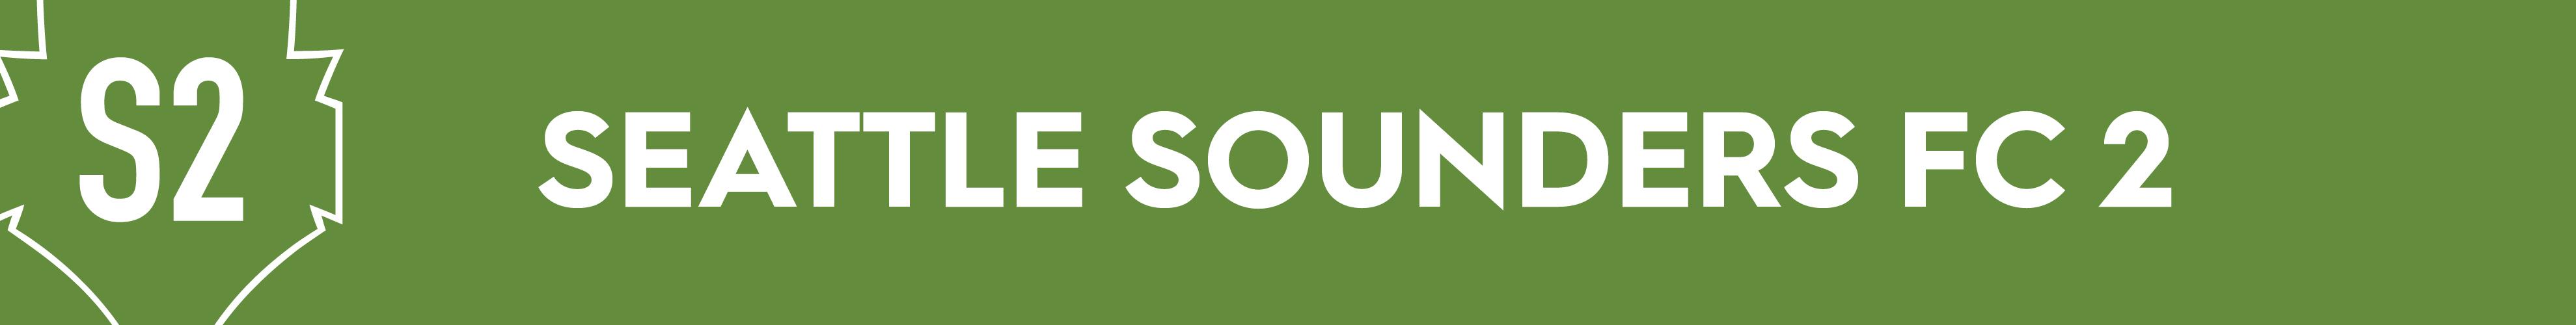 2017 seattle sounders fc 2 schedule